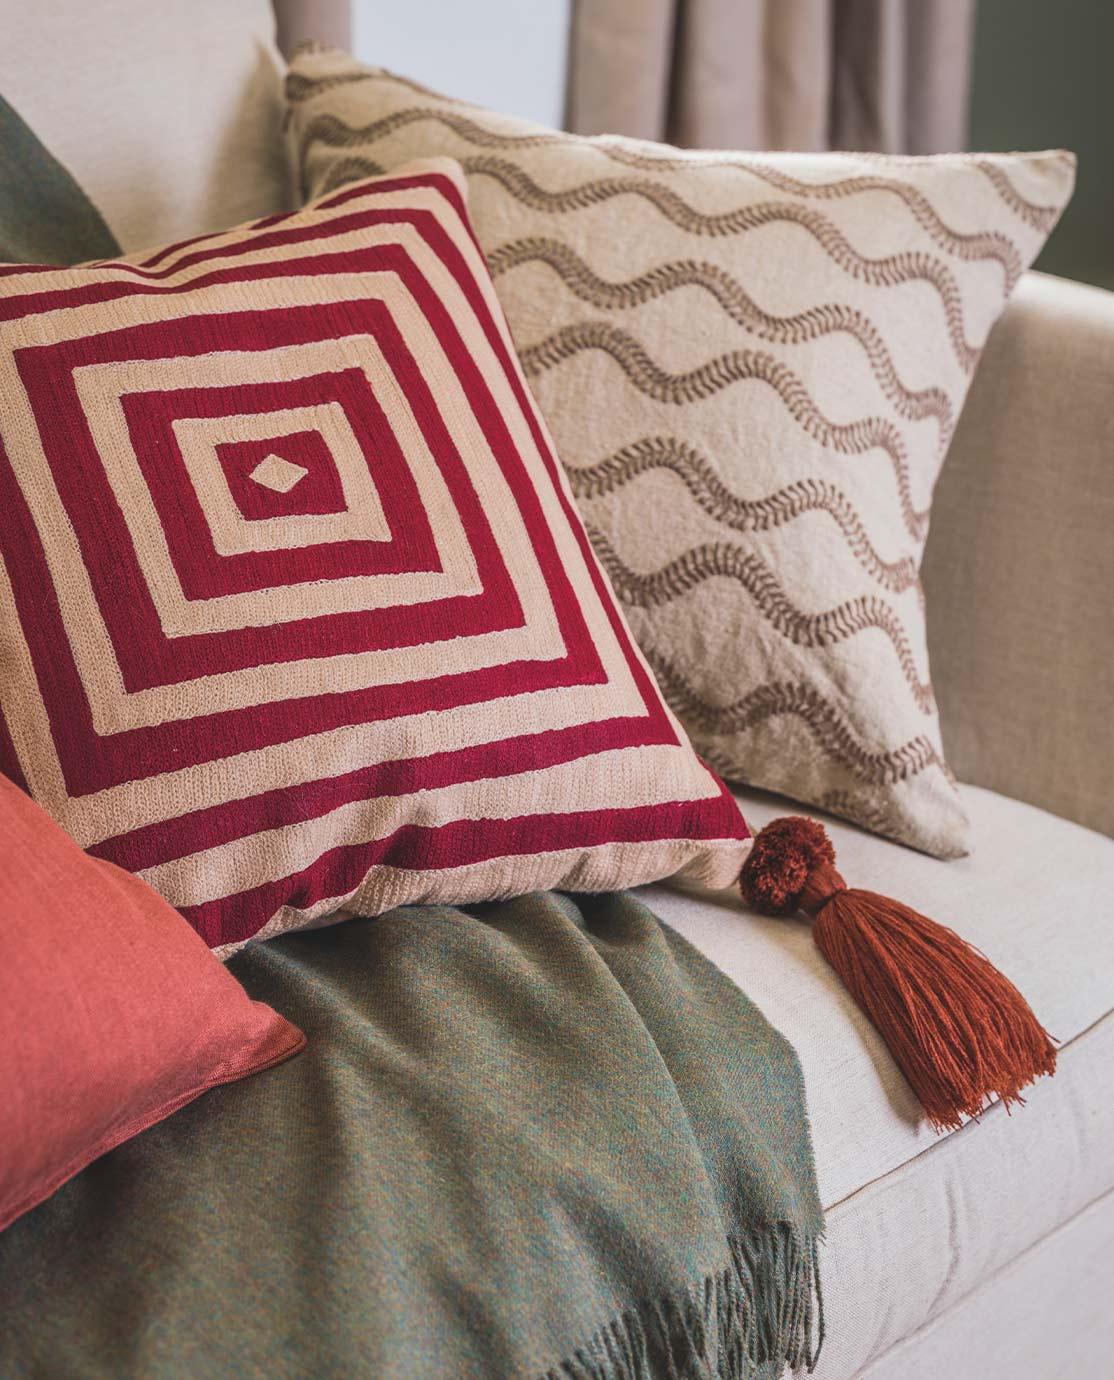 Printed cushions on a white sofa